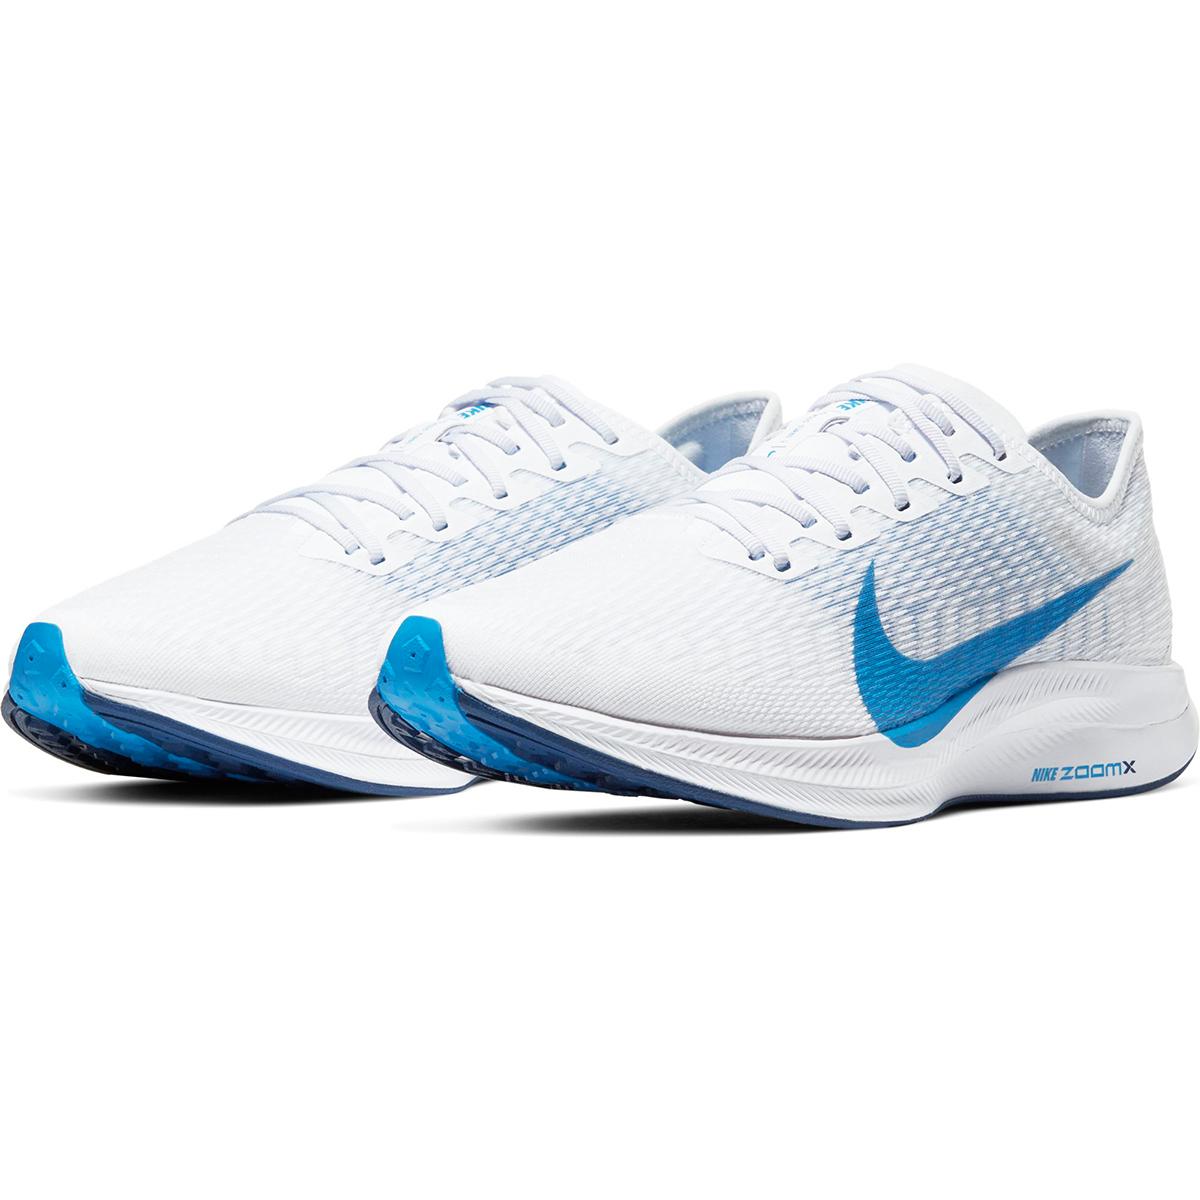 Men's Nike Zoom Pegasus Turbo 2 Running Shoe - Color: White/Blue Void/Football Grey/Photo Blue (Regular Width) - Size: 6, White/Blue Void/Football Grey/Photo Blue, large, image 4